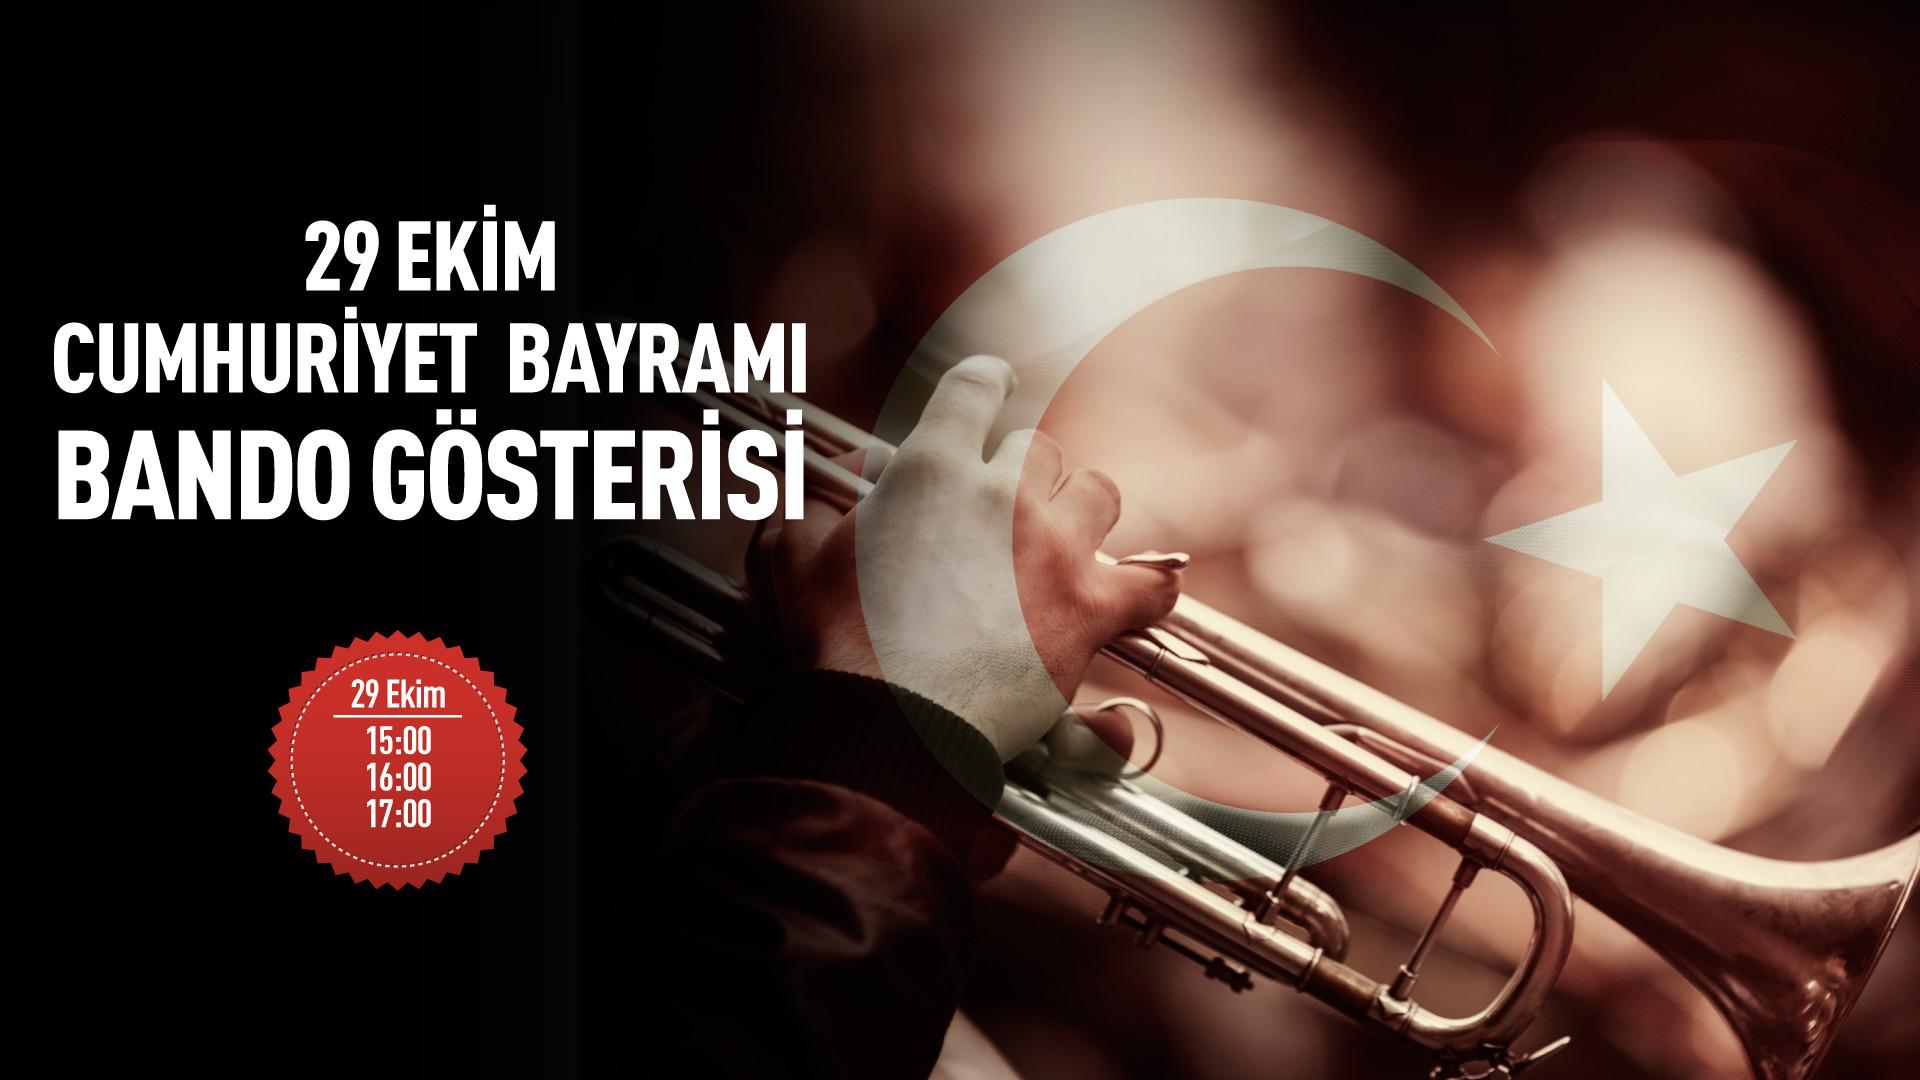 29 Ekim Cumhuriyet Bayrami Bando Gosterisi Apocalipse A Volta De